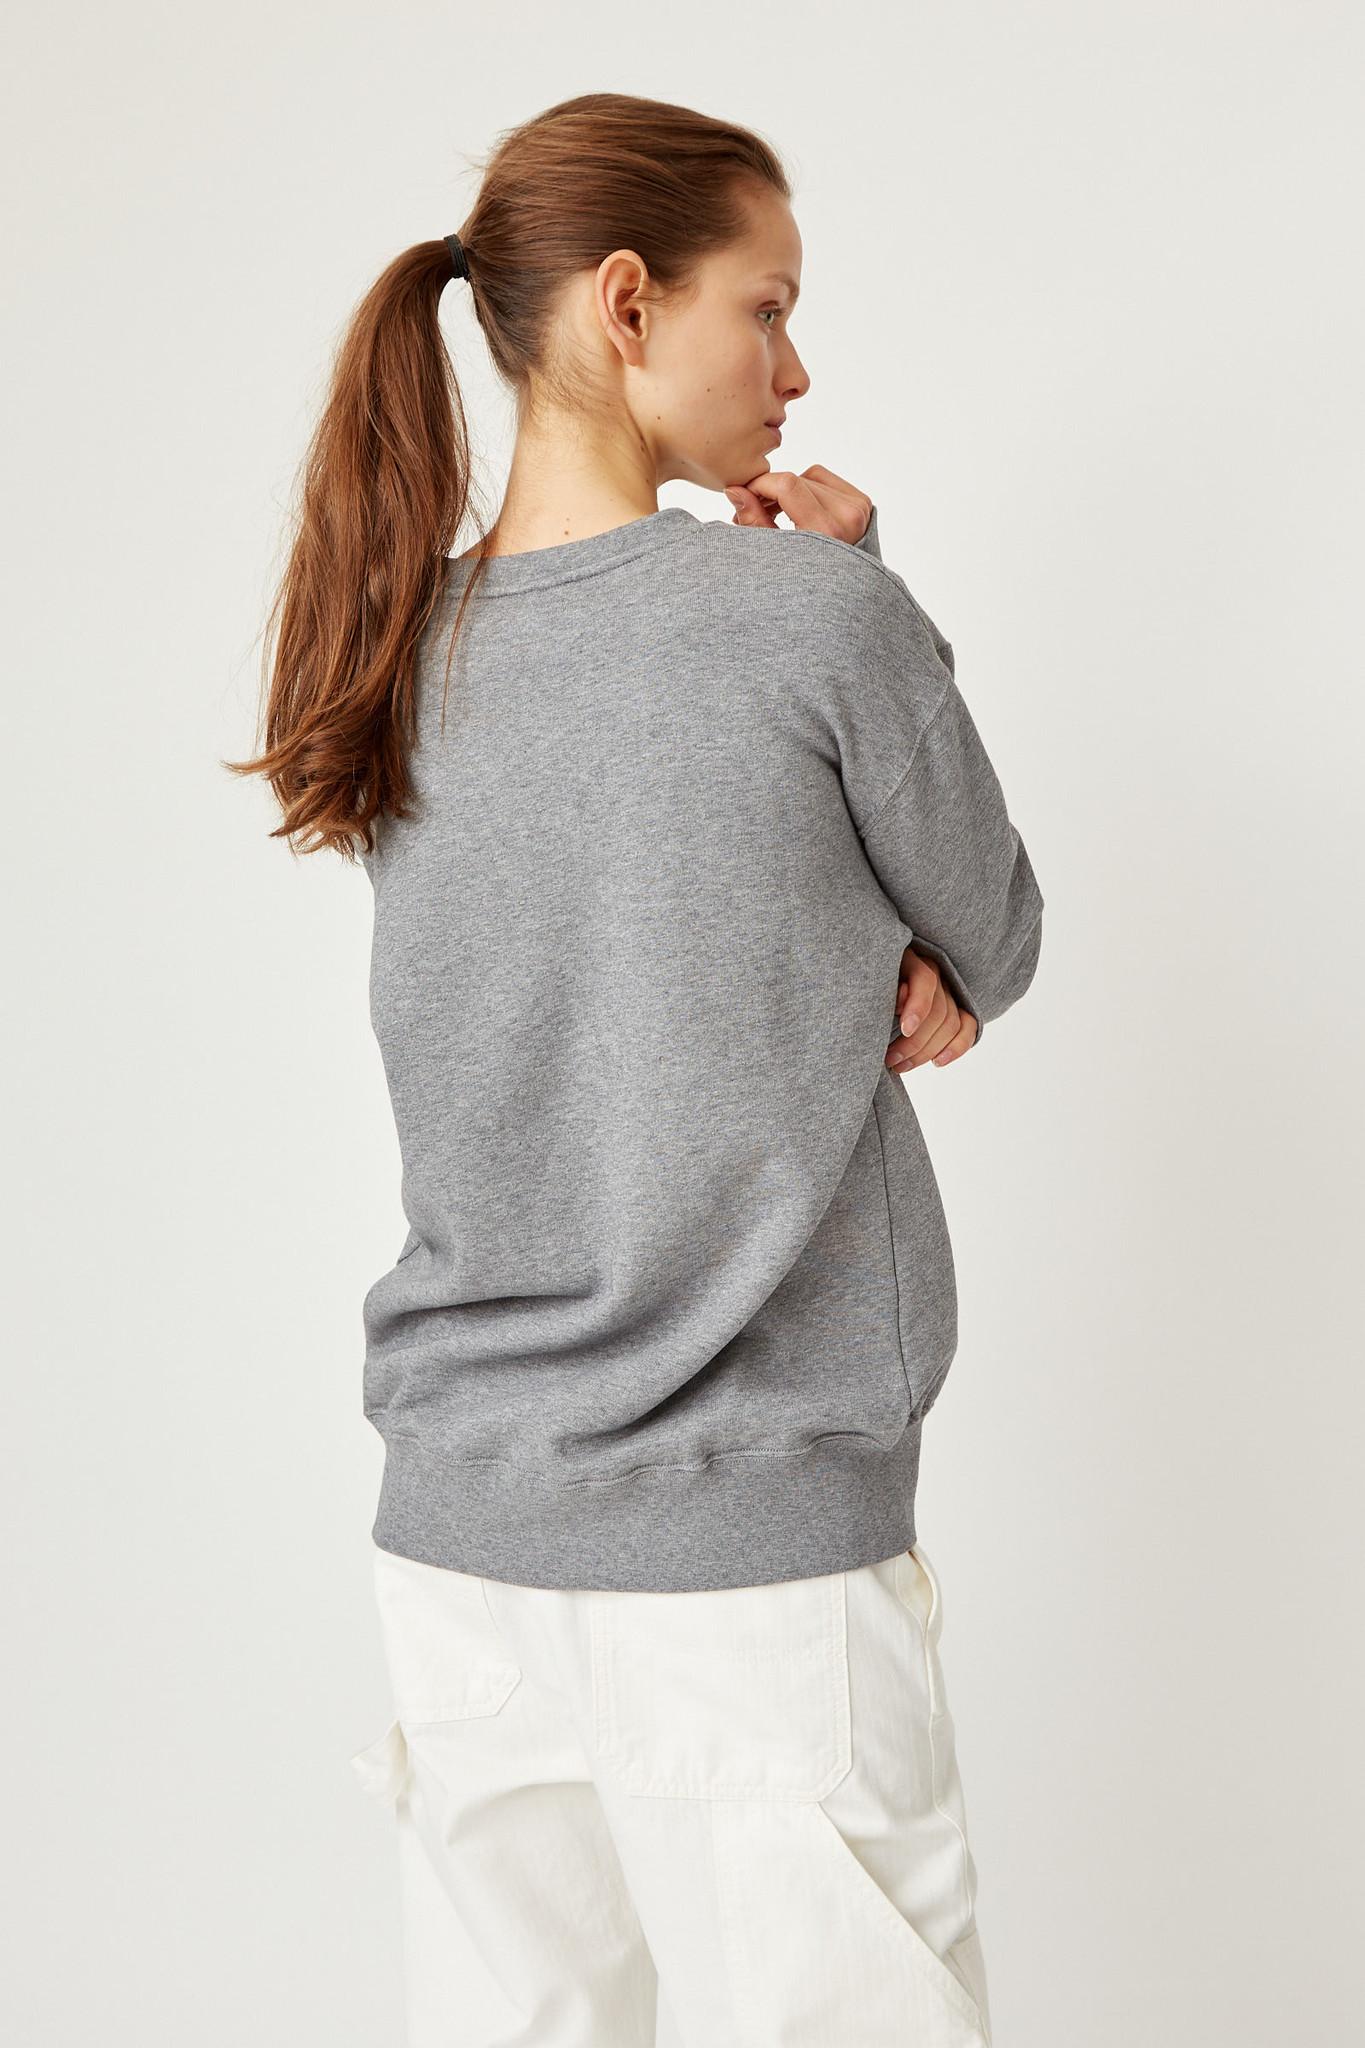 Hugh Sweatshirt Grey Melange Unisex-5